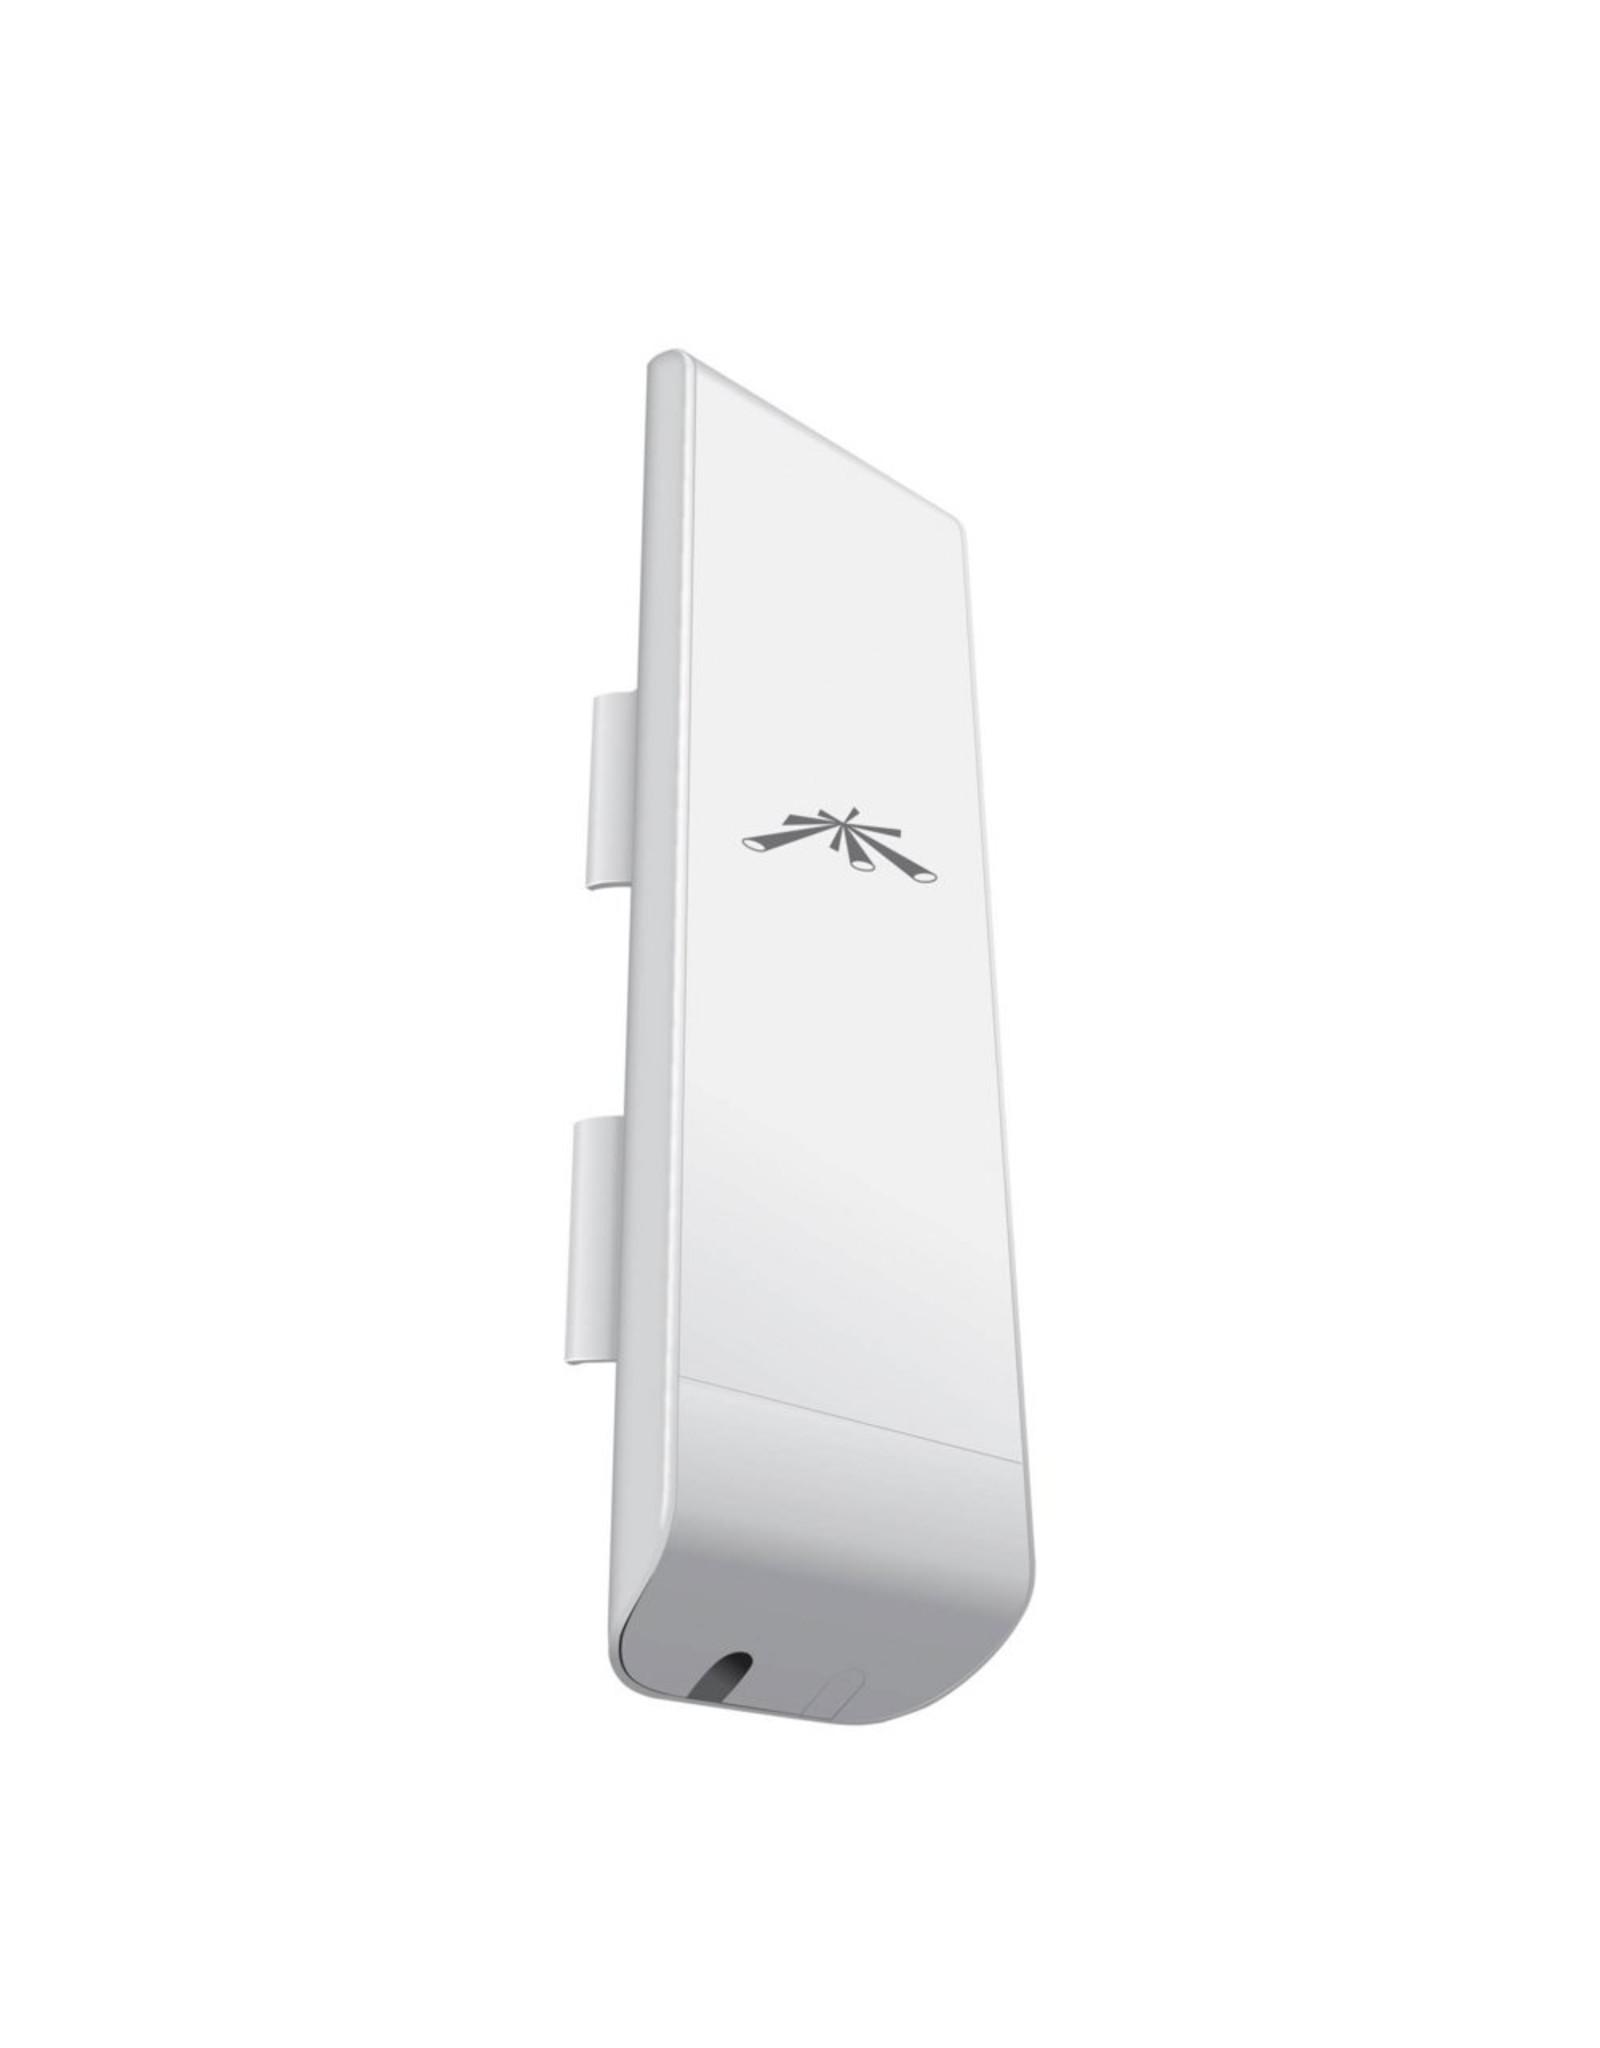 Ubiquiti airMAX NanoStation M5 5GHz/16dBi/150+ Mbps